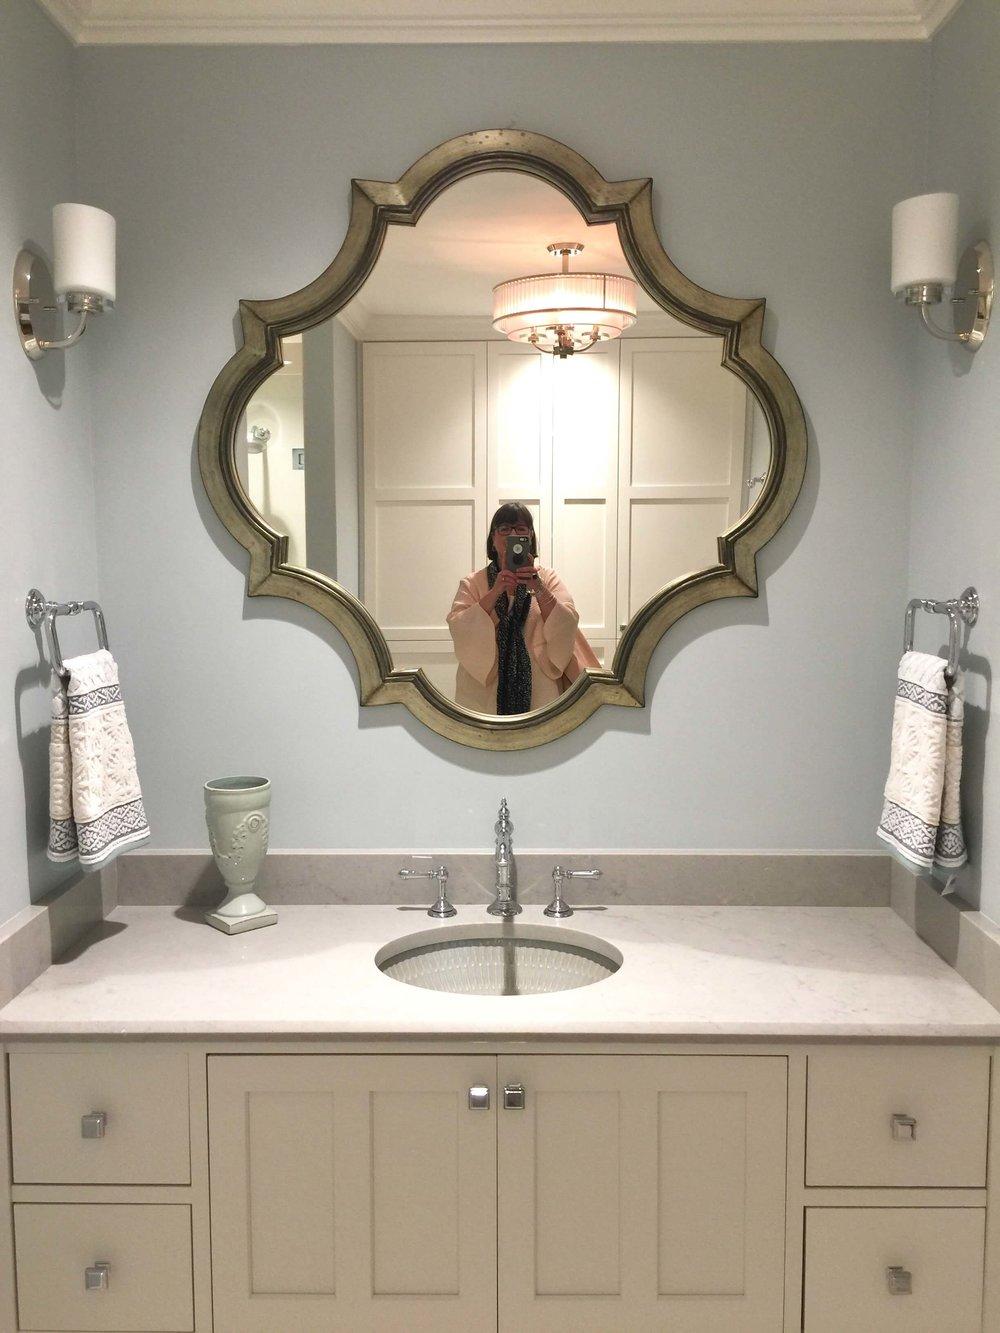 Guest bathroom -The New American Remodel - Orlando, KBIS2018 #bathroomvanity #mirror